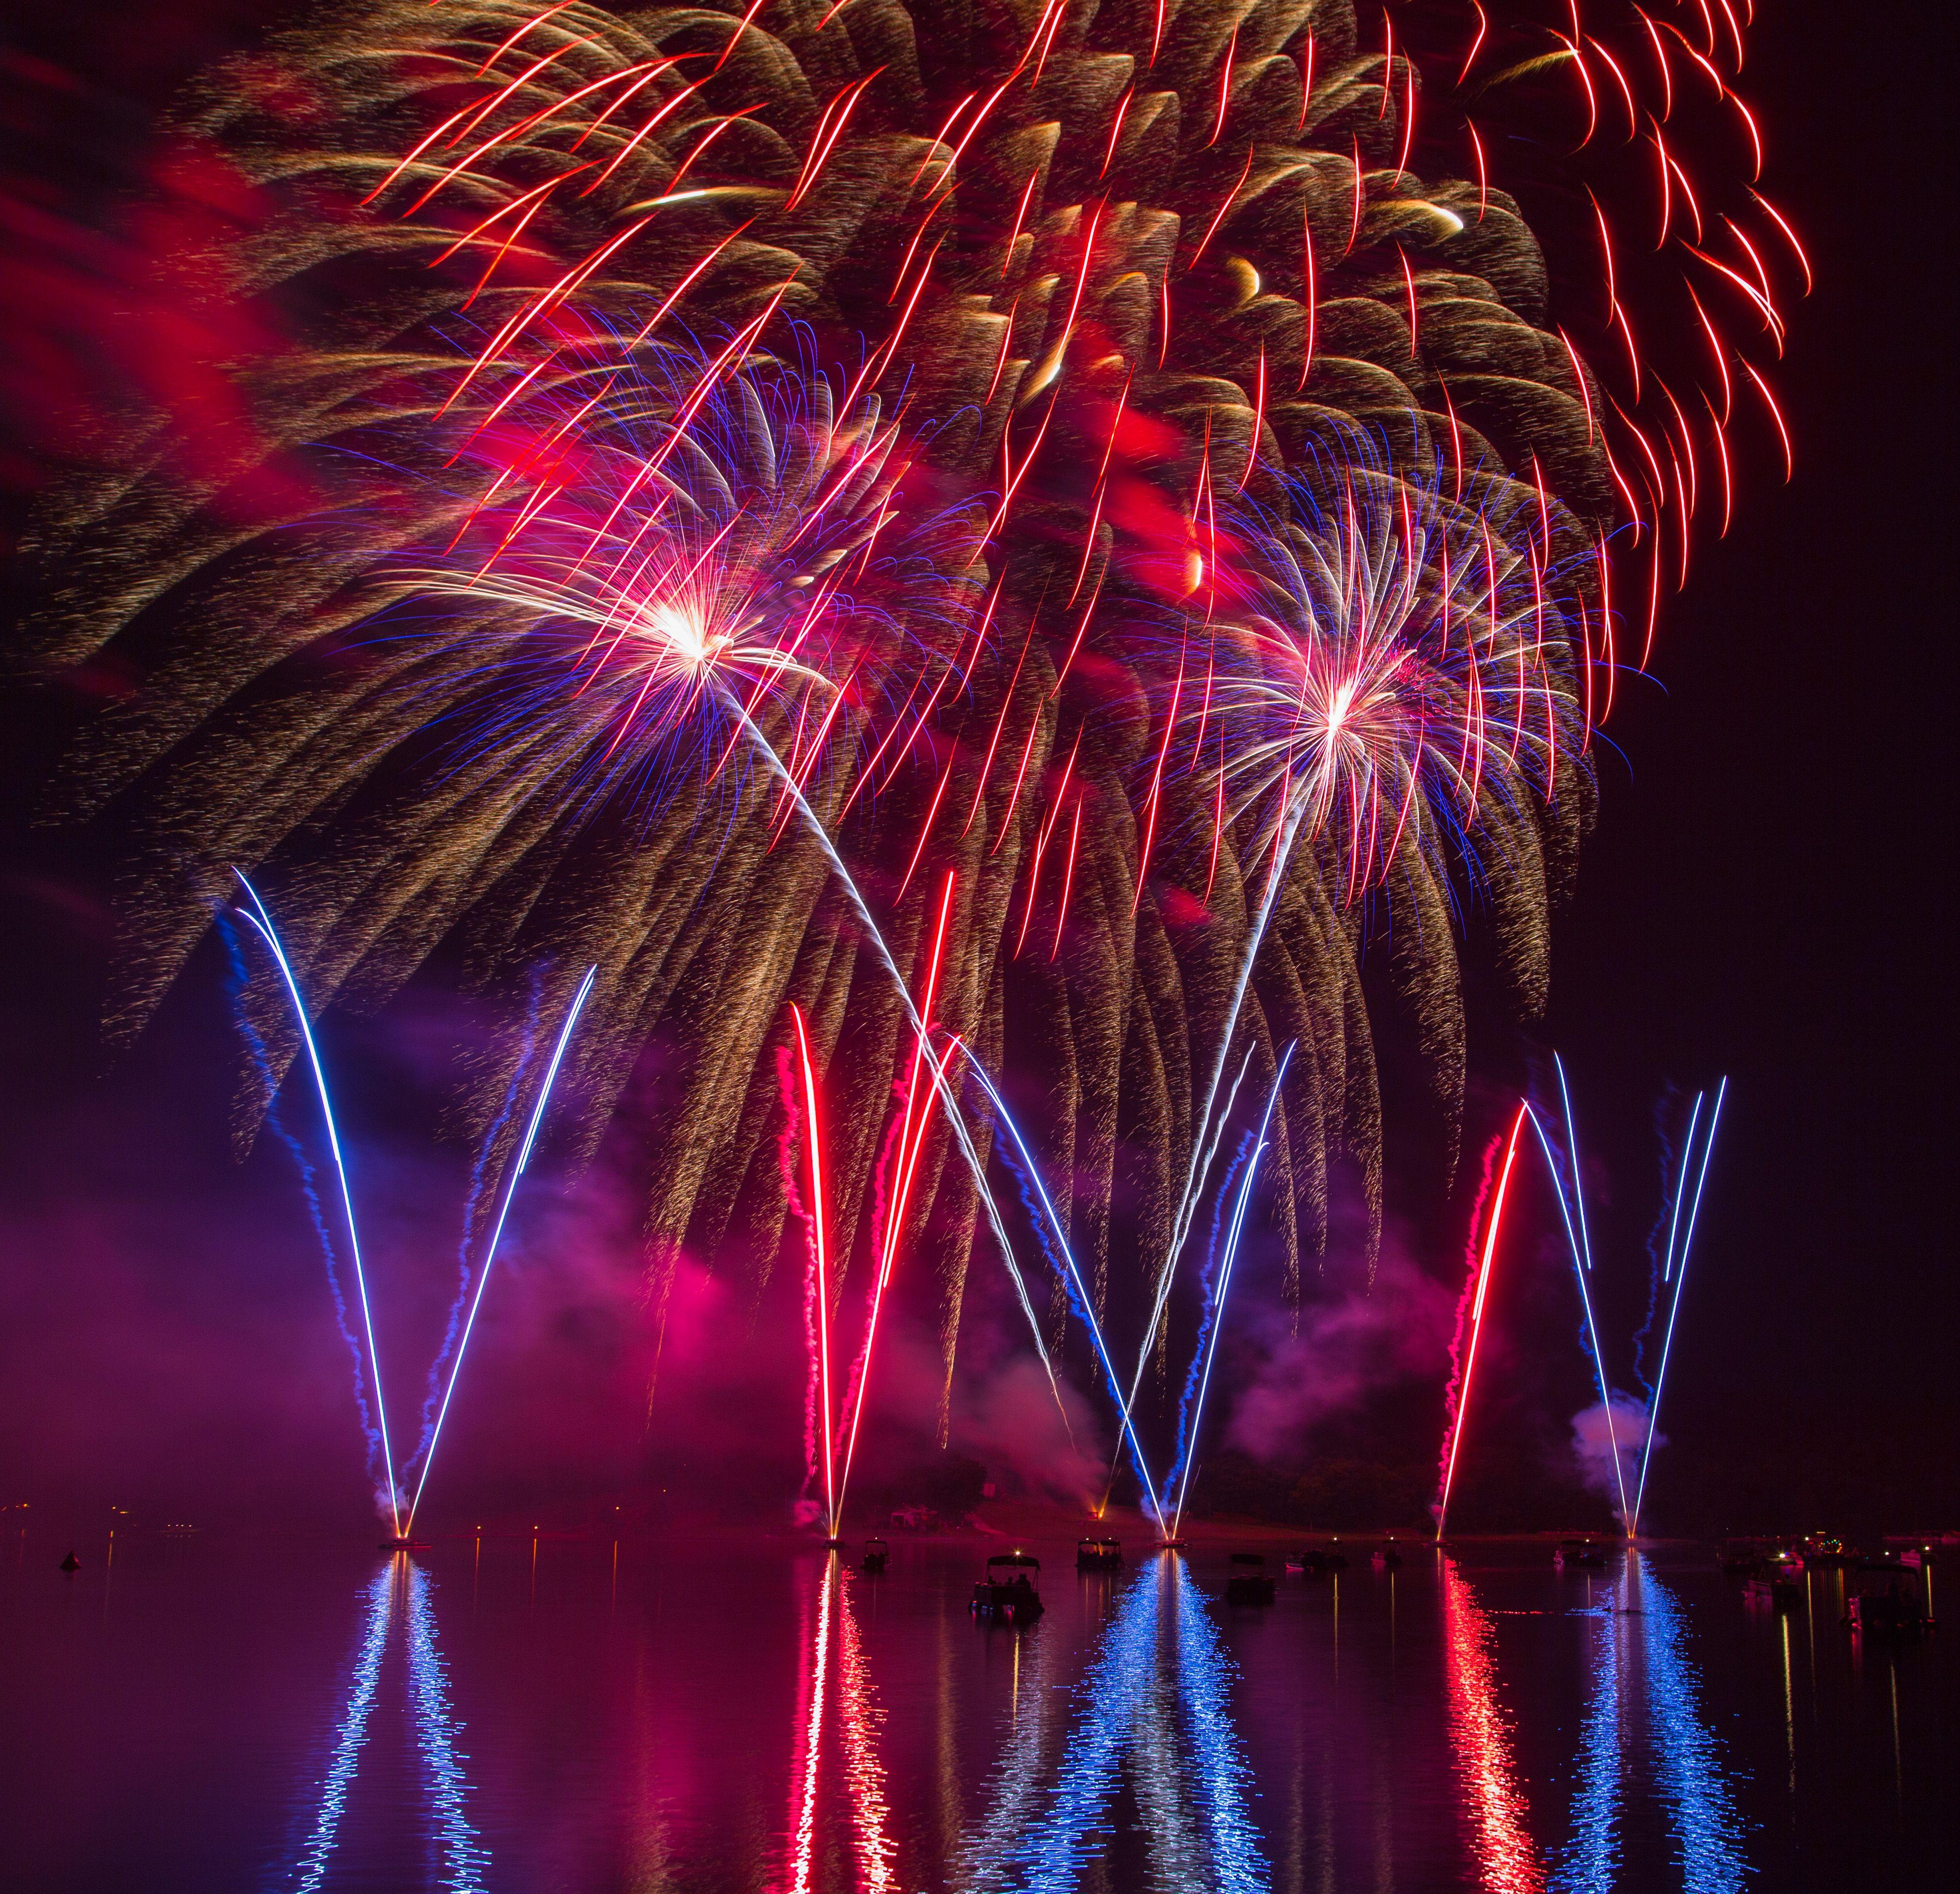 Innsbrook Know Fireworks Www Innsbrook Resort Com Innsbrook Natural Landmarks Fireworks